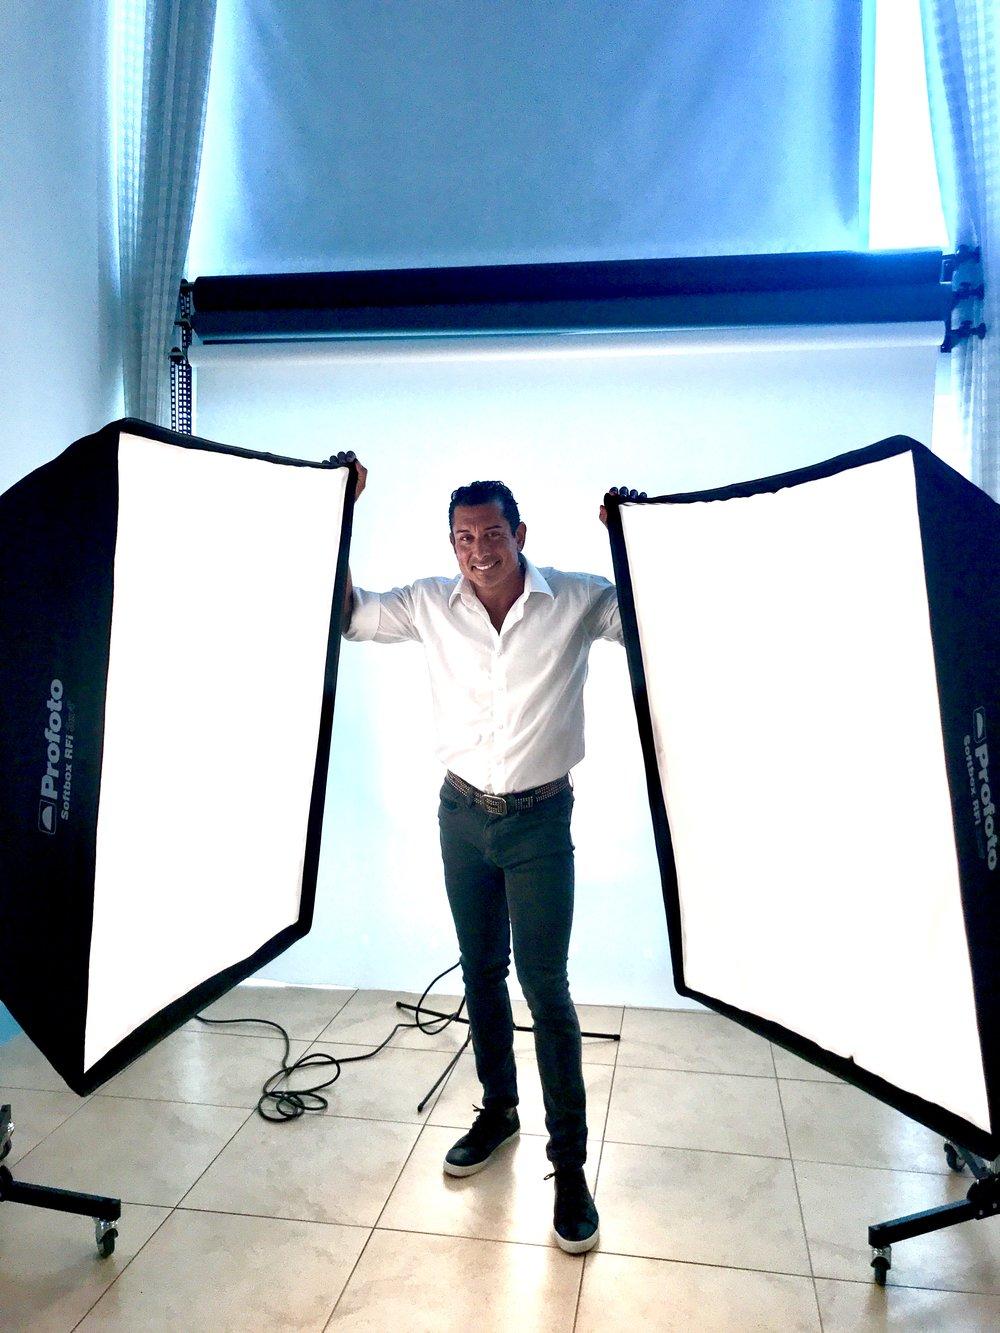 PROFOTO STUDIO LIGHTING -